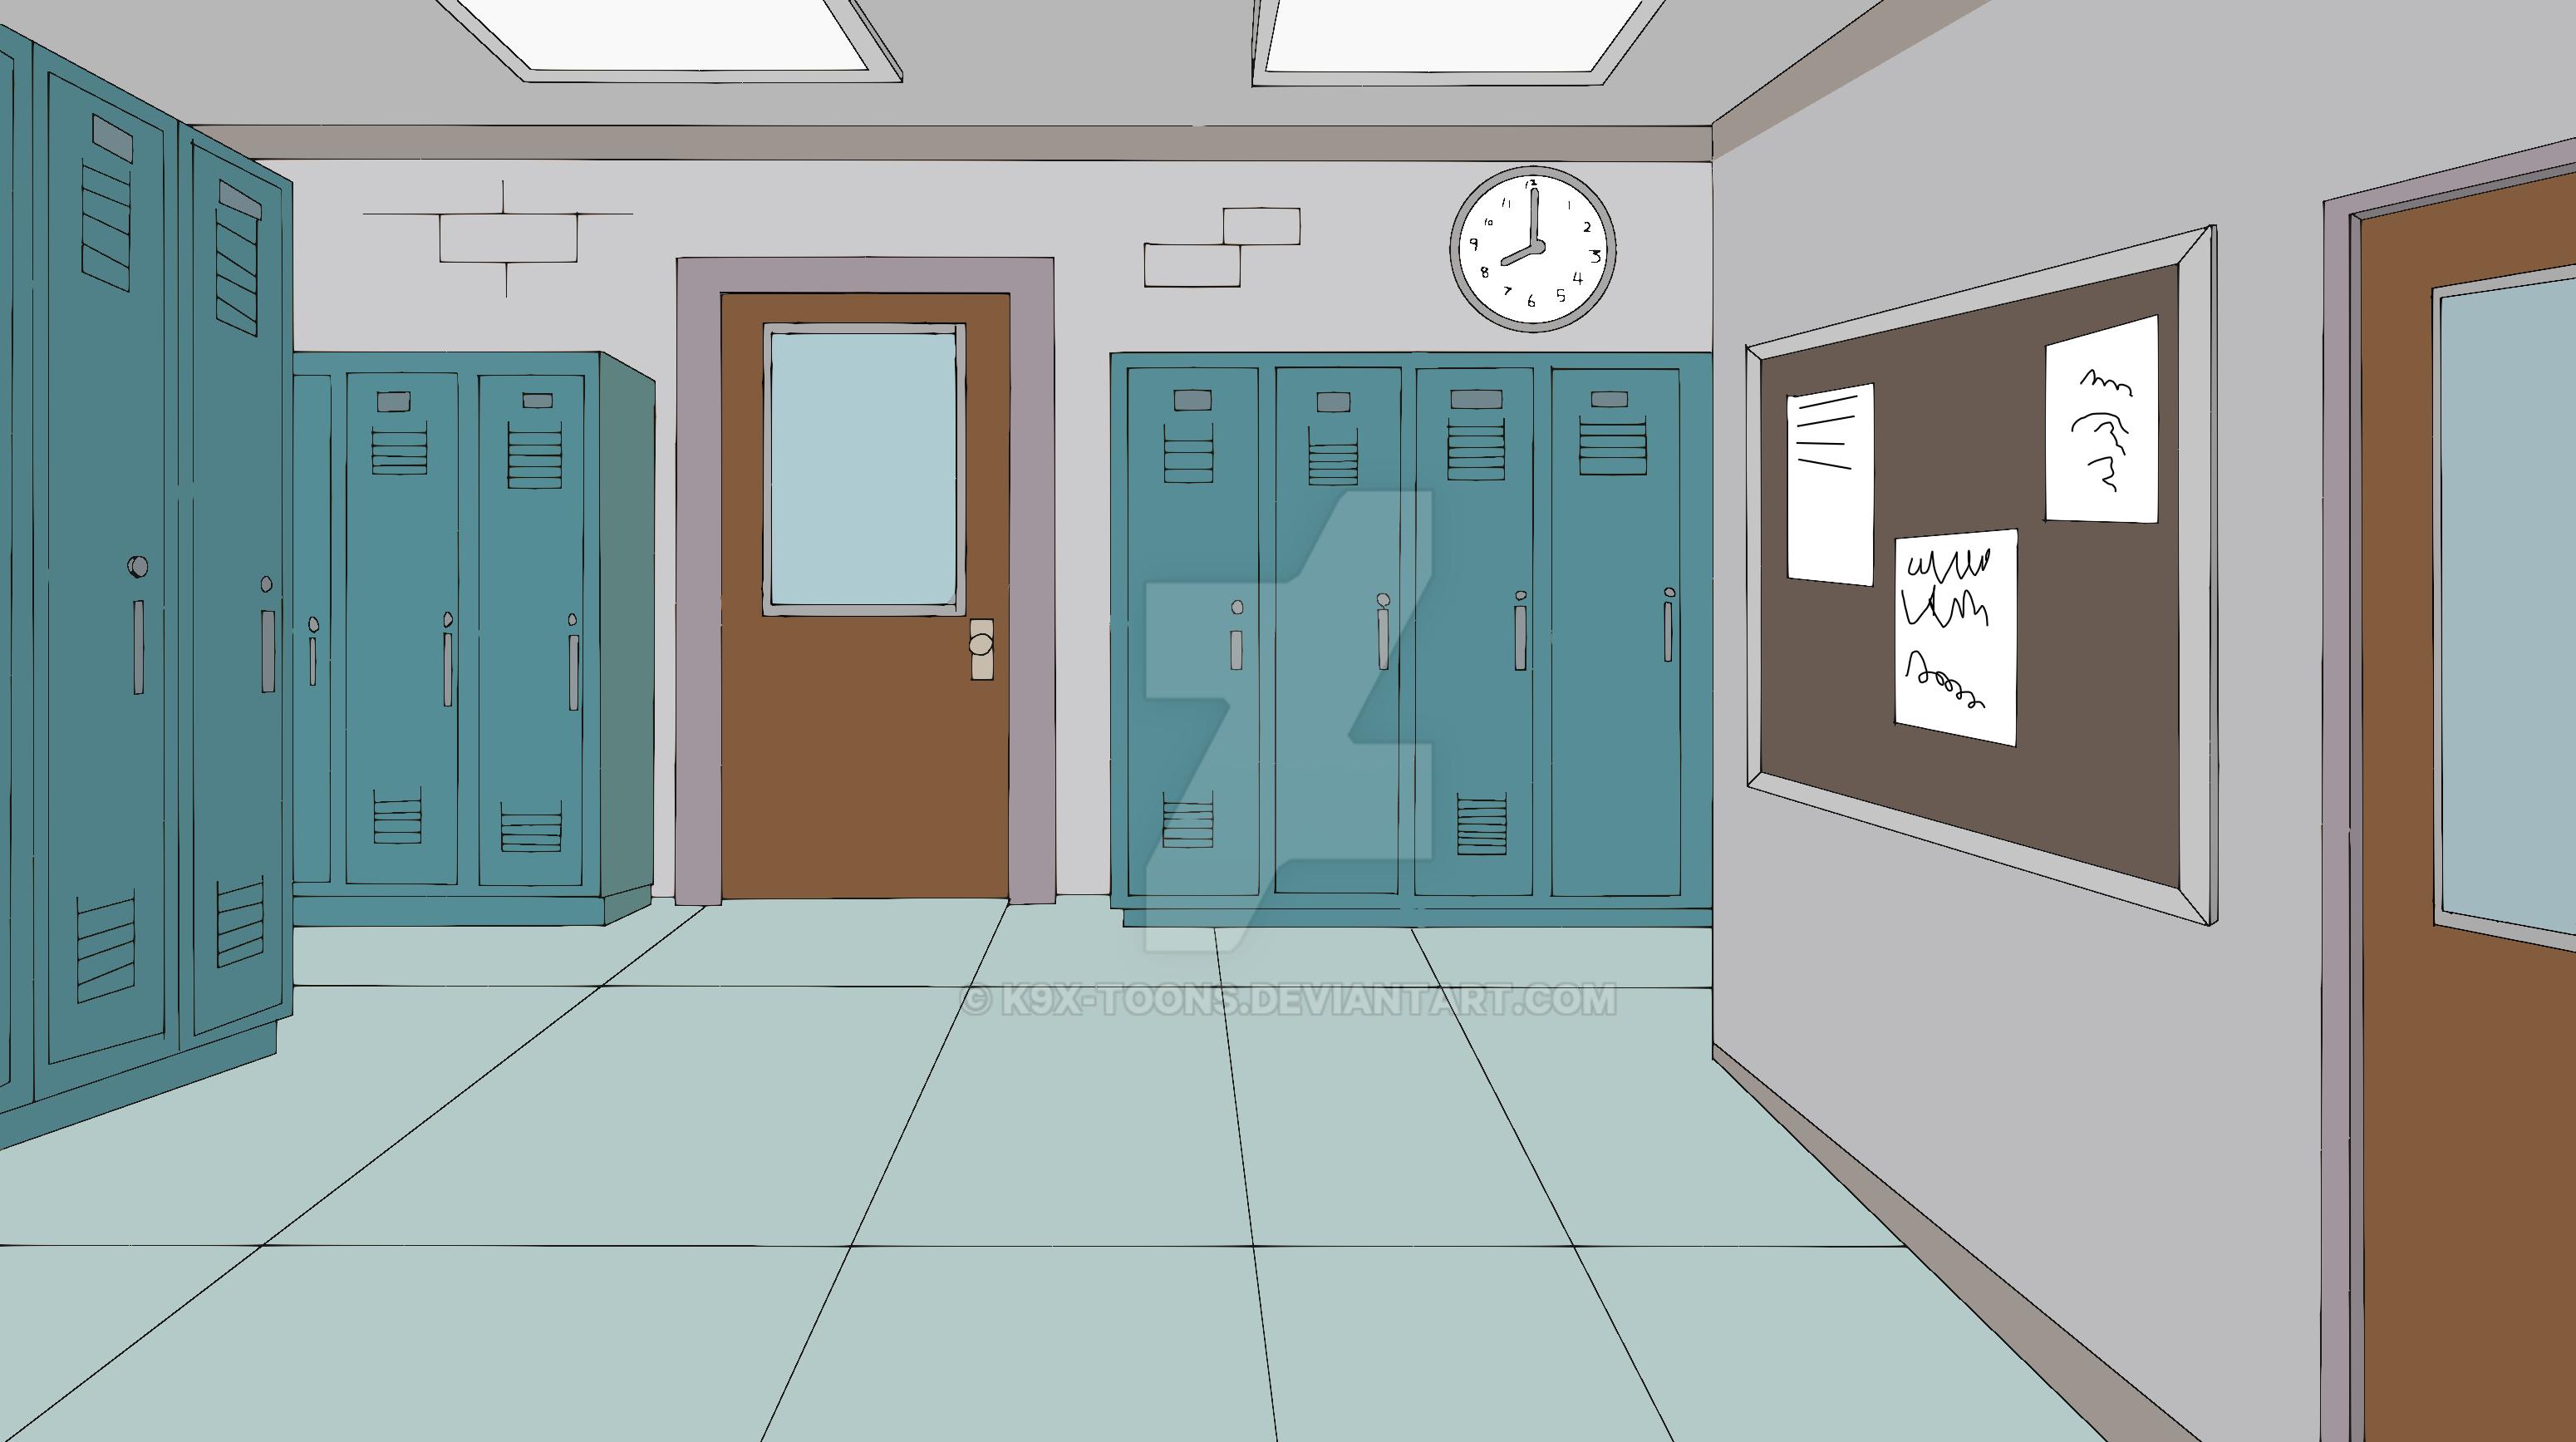 school hallway clip art - photo #10